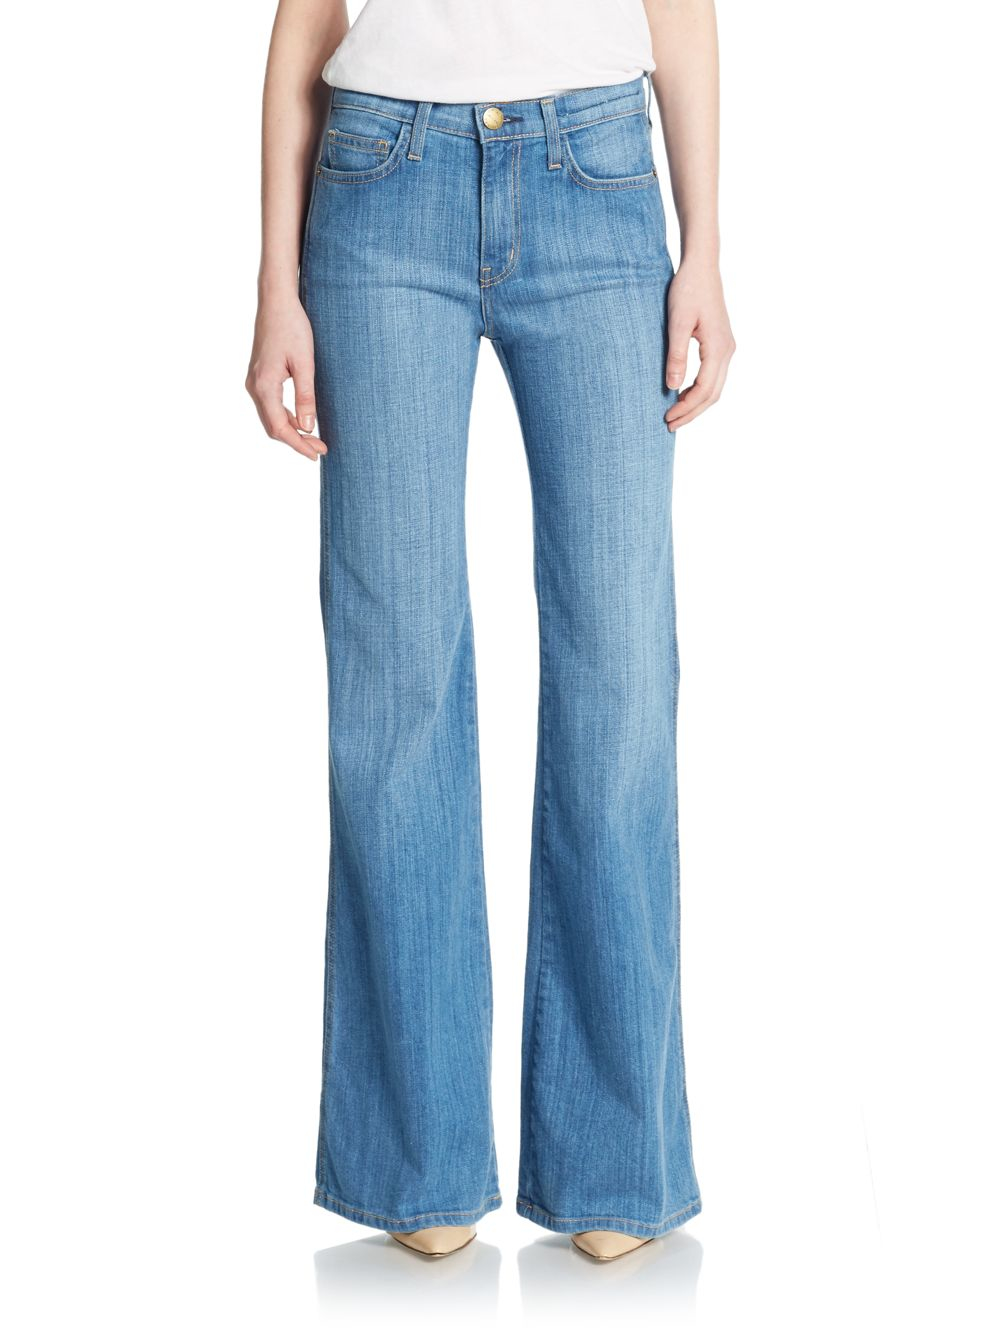 Current/elliott Girl Crush Wide-leg Jeans in Blue | Lyst